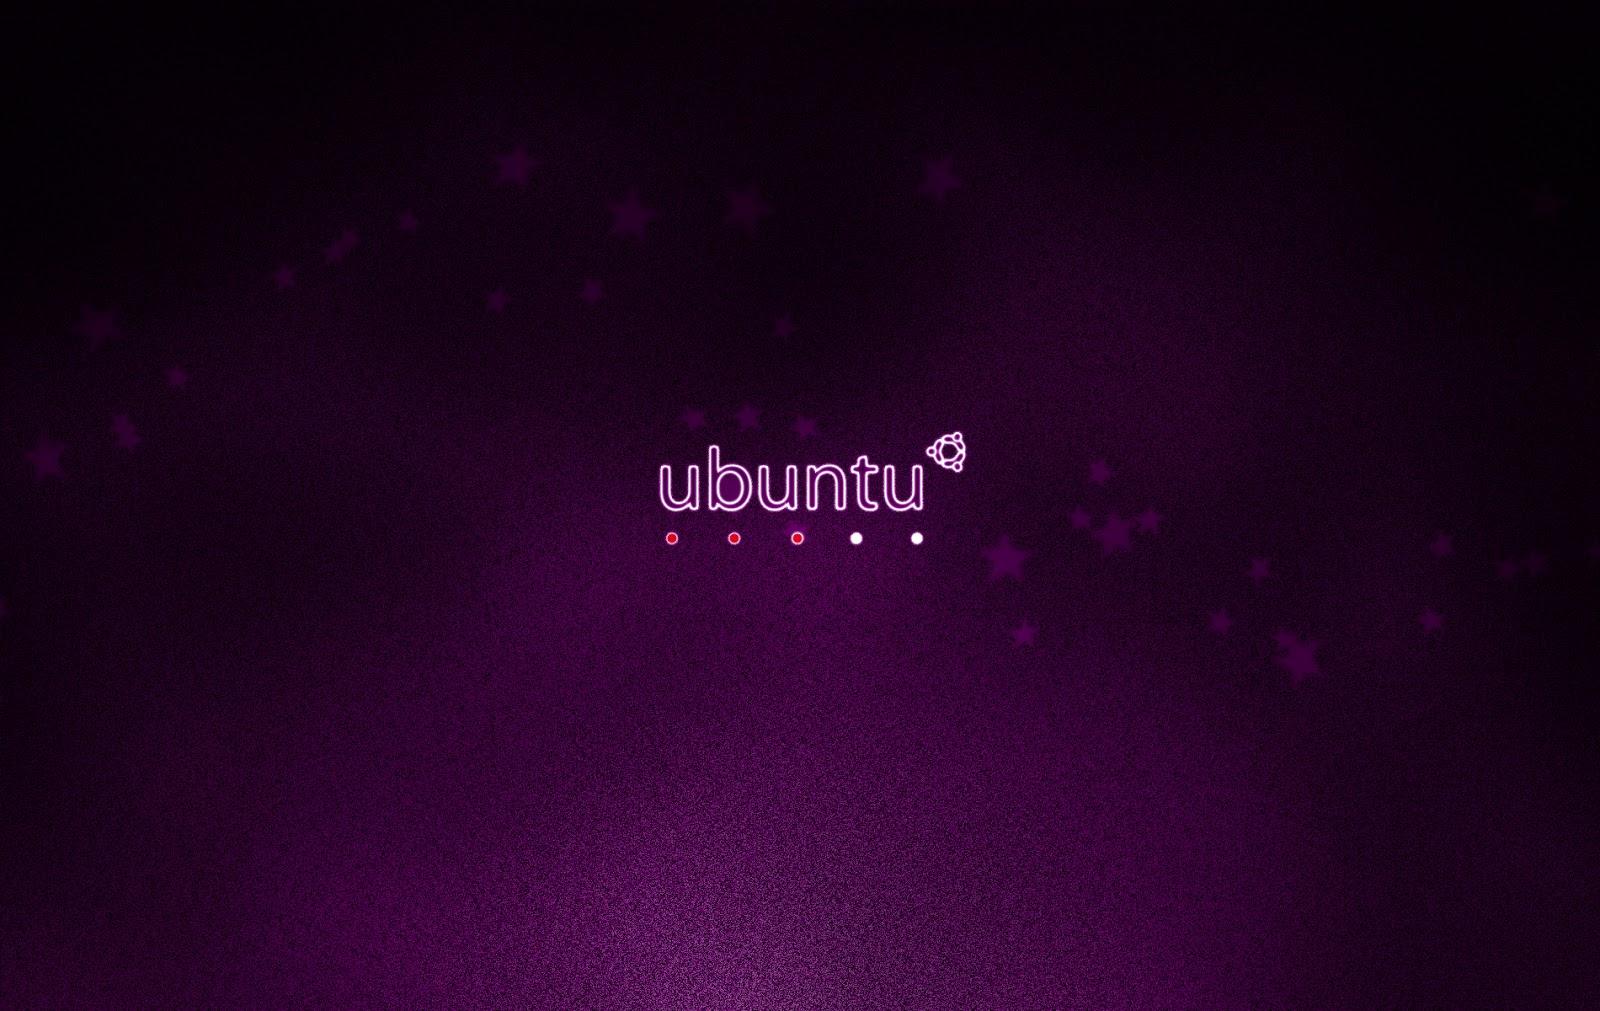 HD Wallpapers UBUNTU HD WALLPAPERS 1600x1011